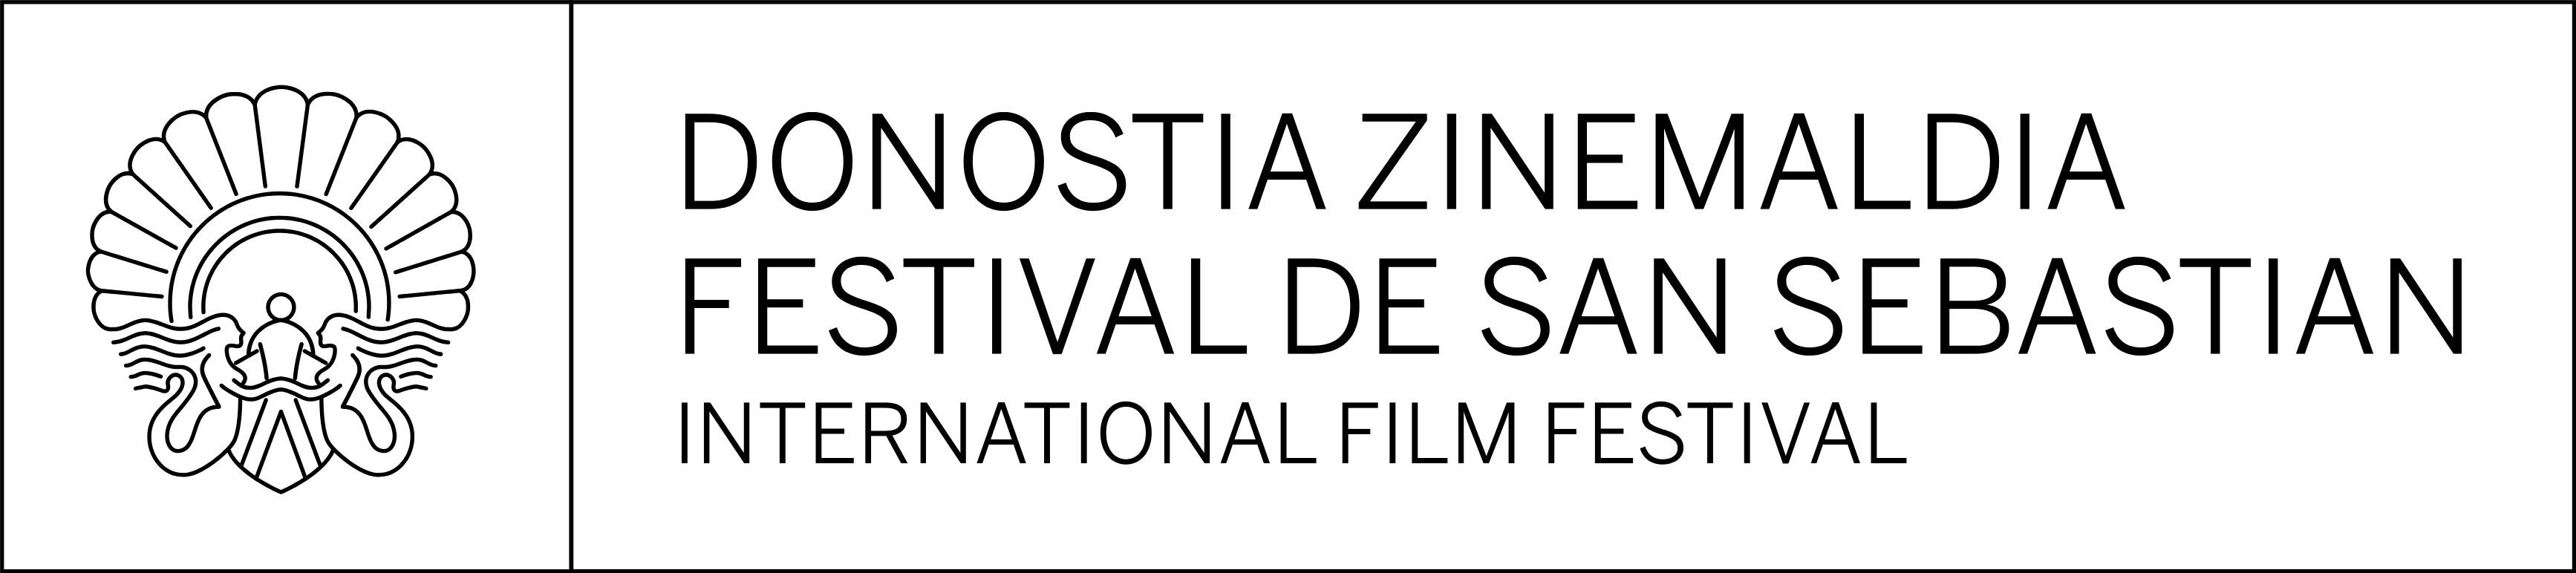 festival-de-cine-de-san-sebastian